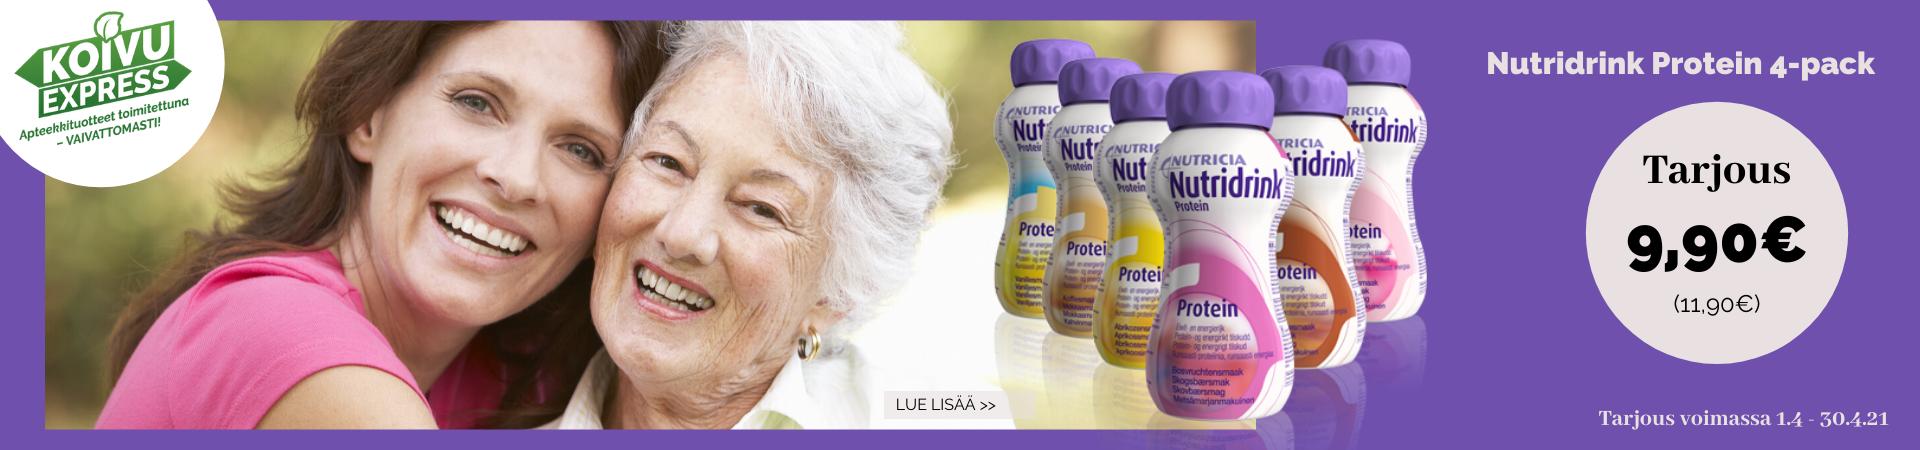 Nutridrink Protein tarjous